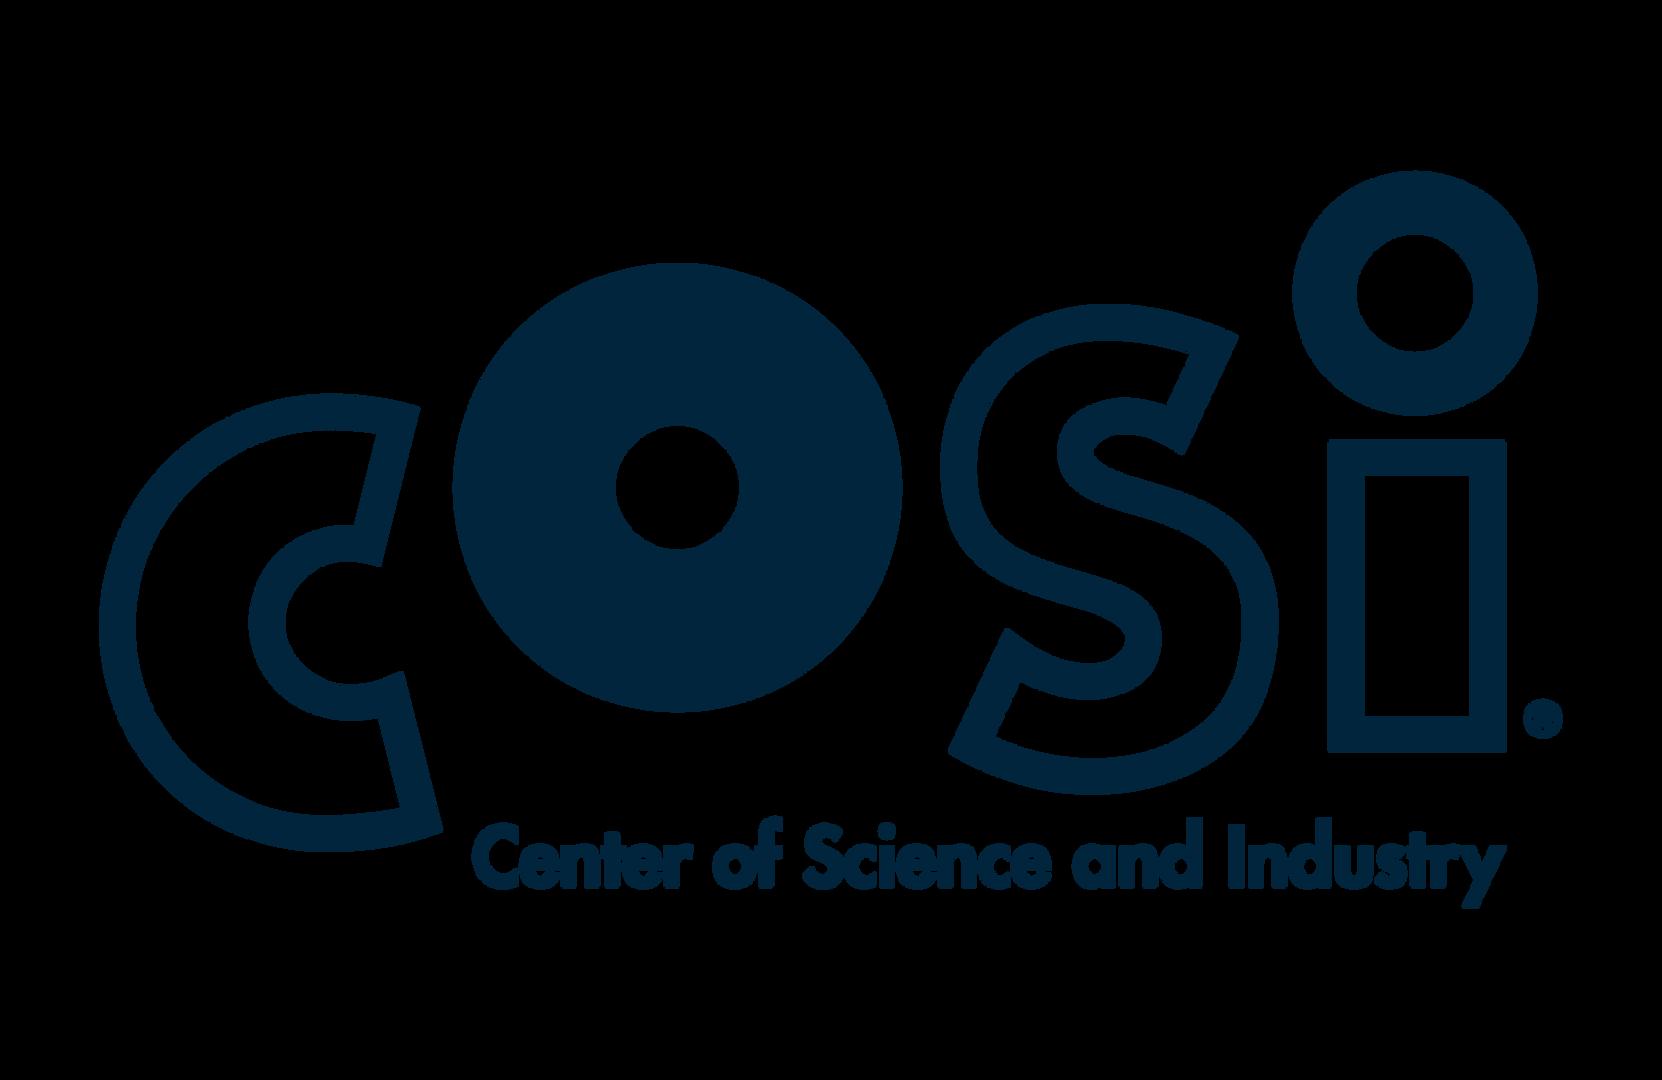 COSI logo Blue-NoBackground.png